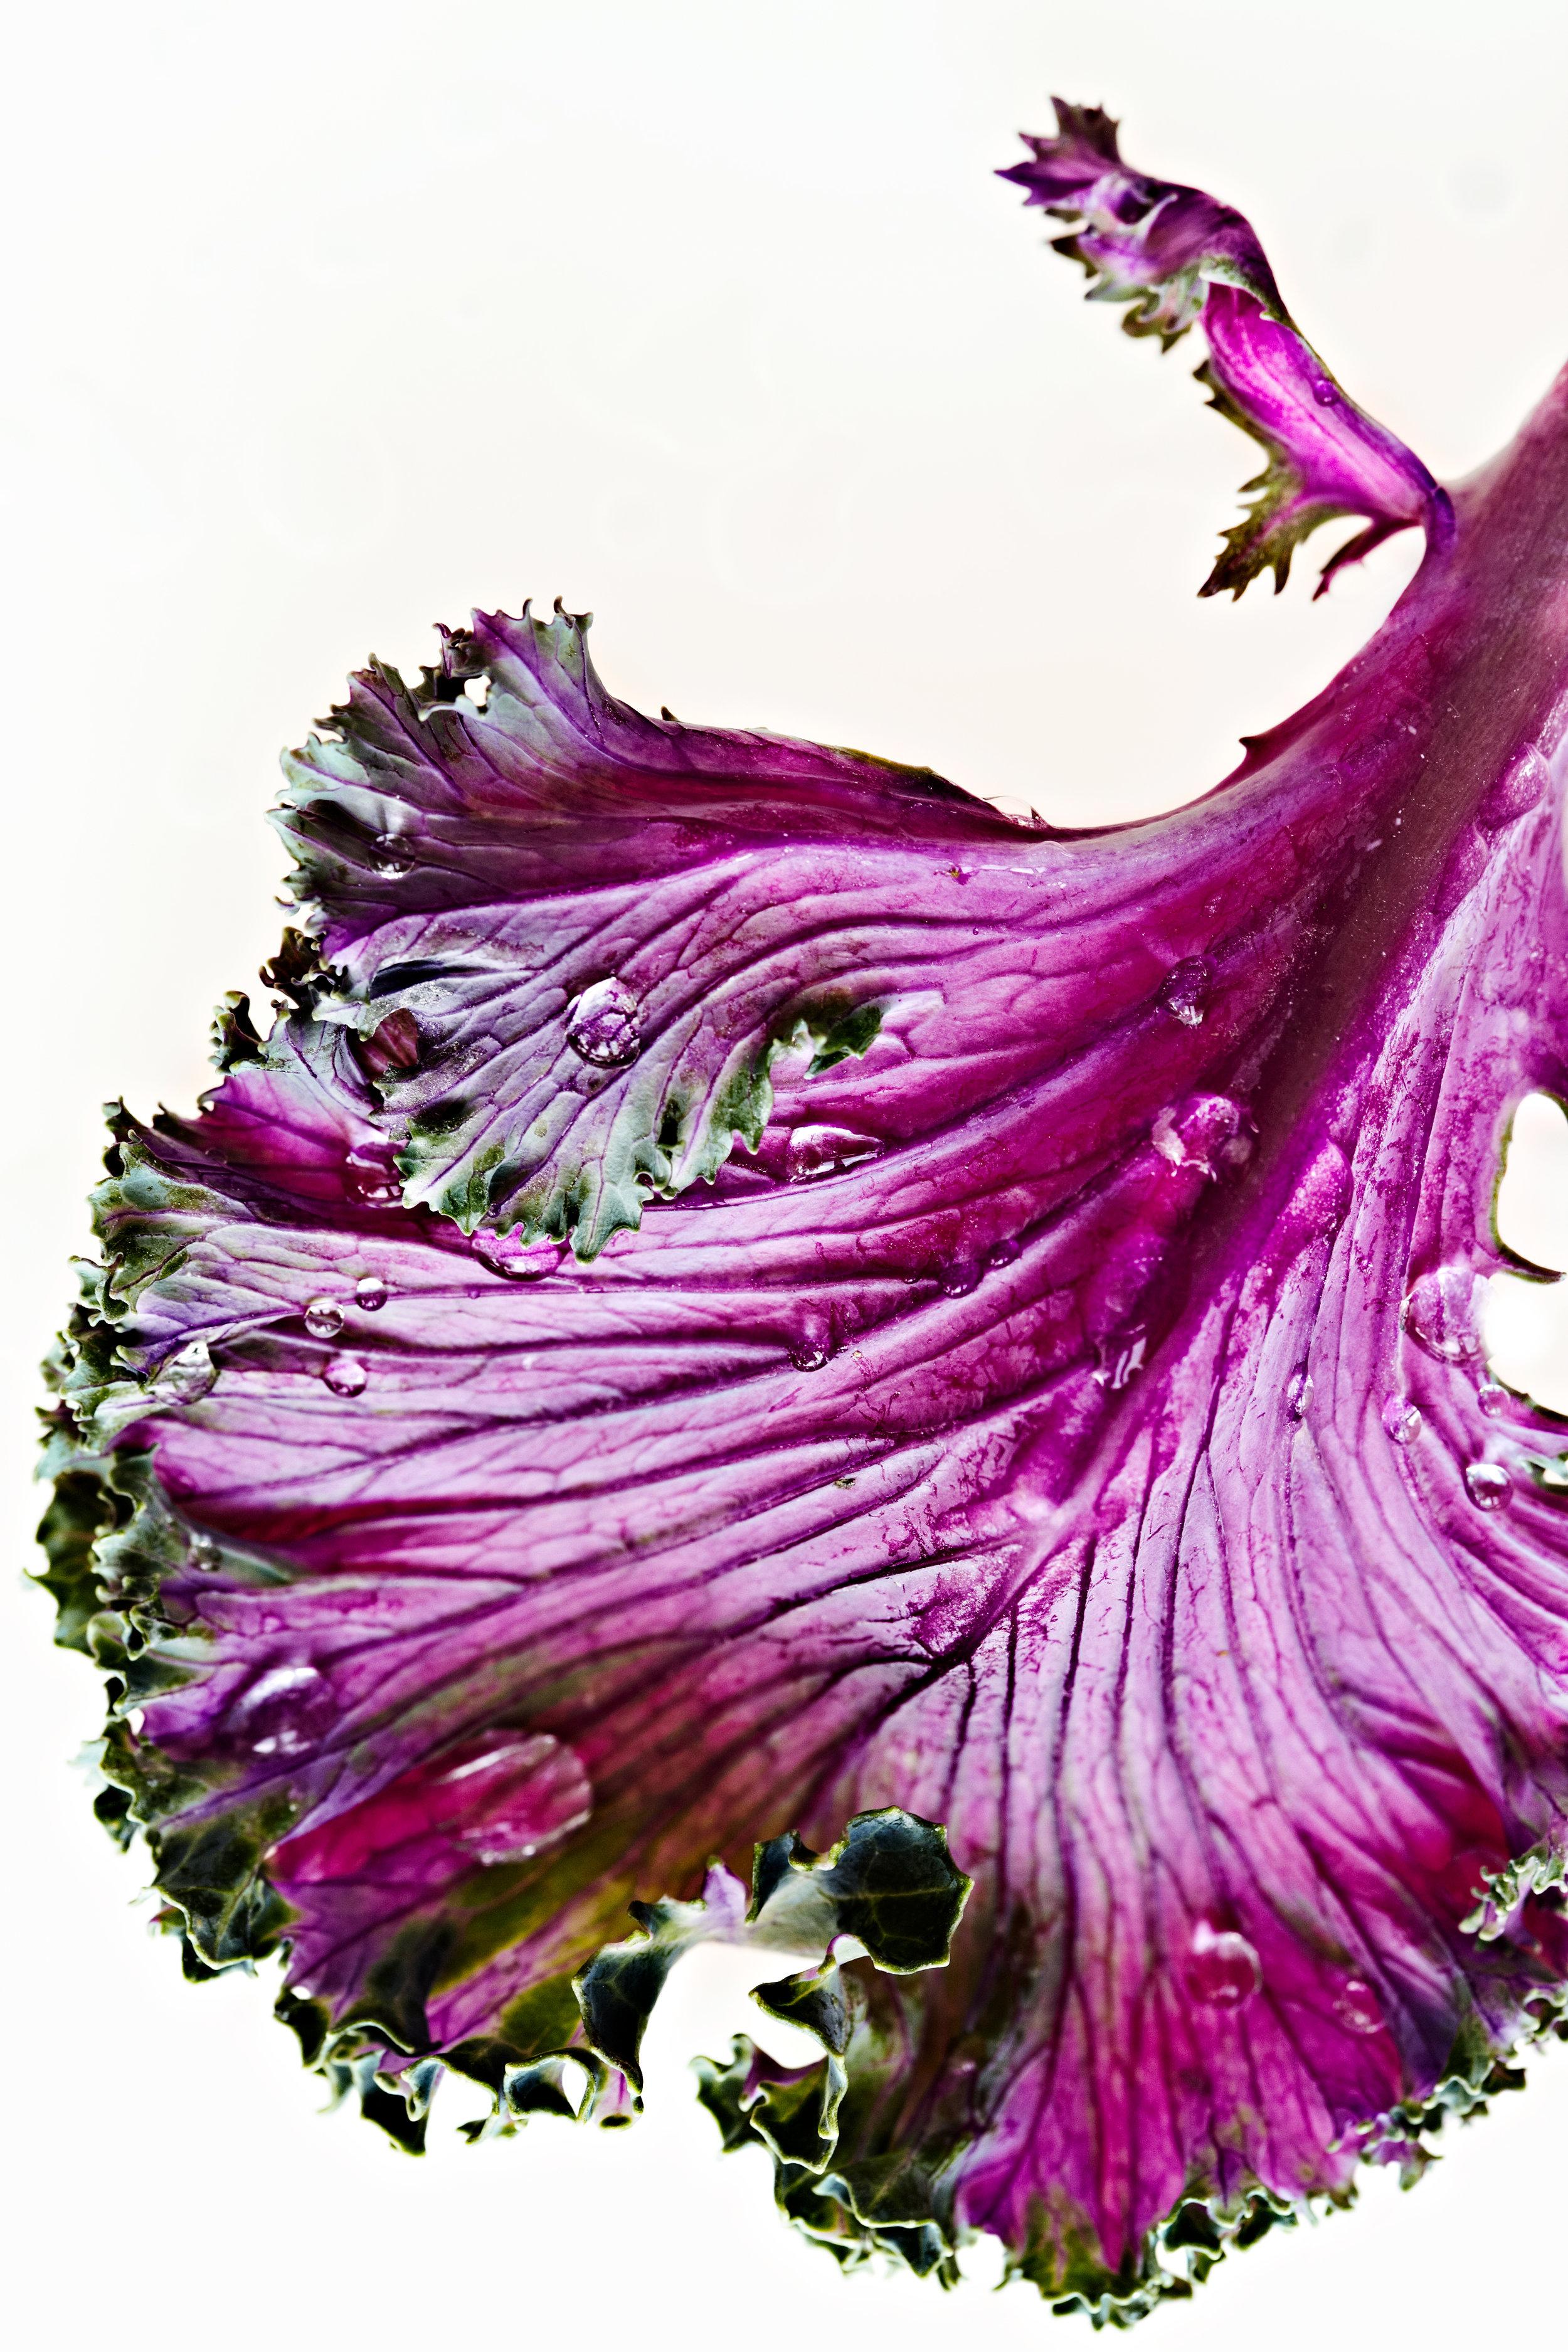 Purple kale on white